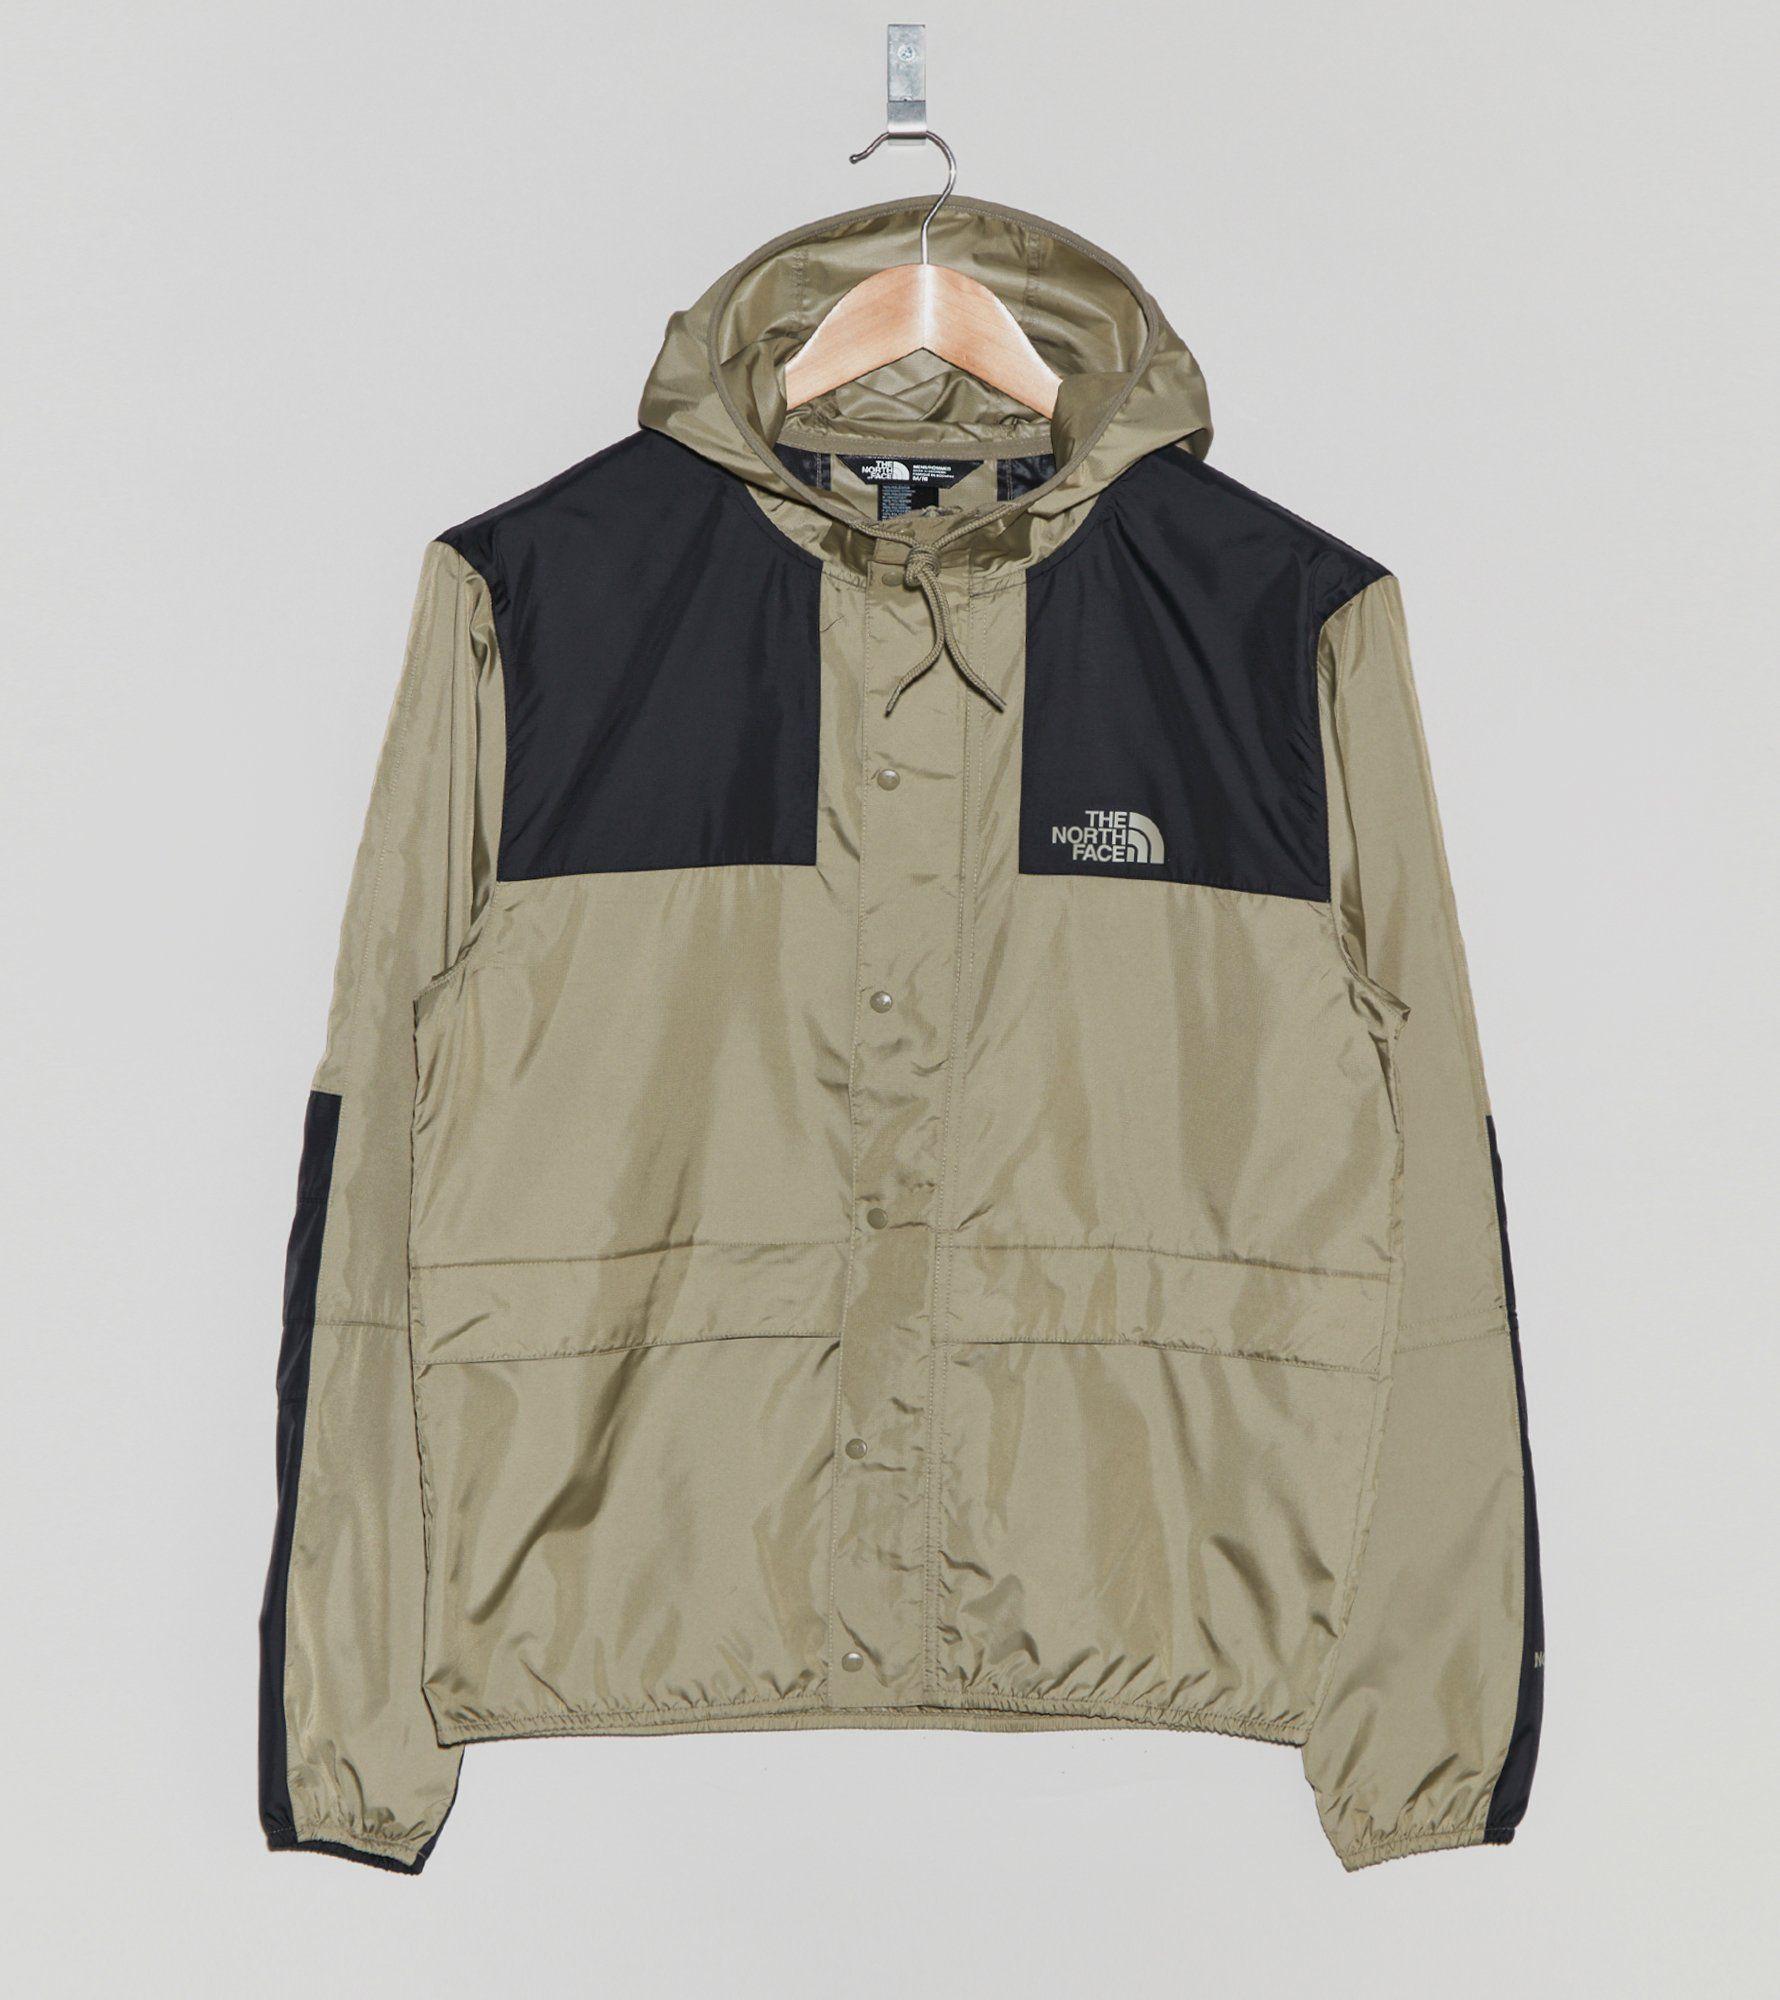 d7d6fc5425 The North Face 1985 Seasonal Mountain Jacket